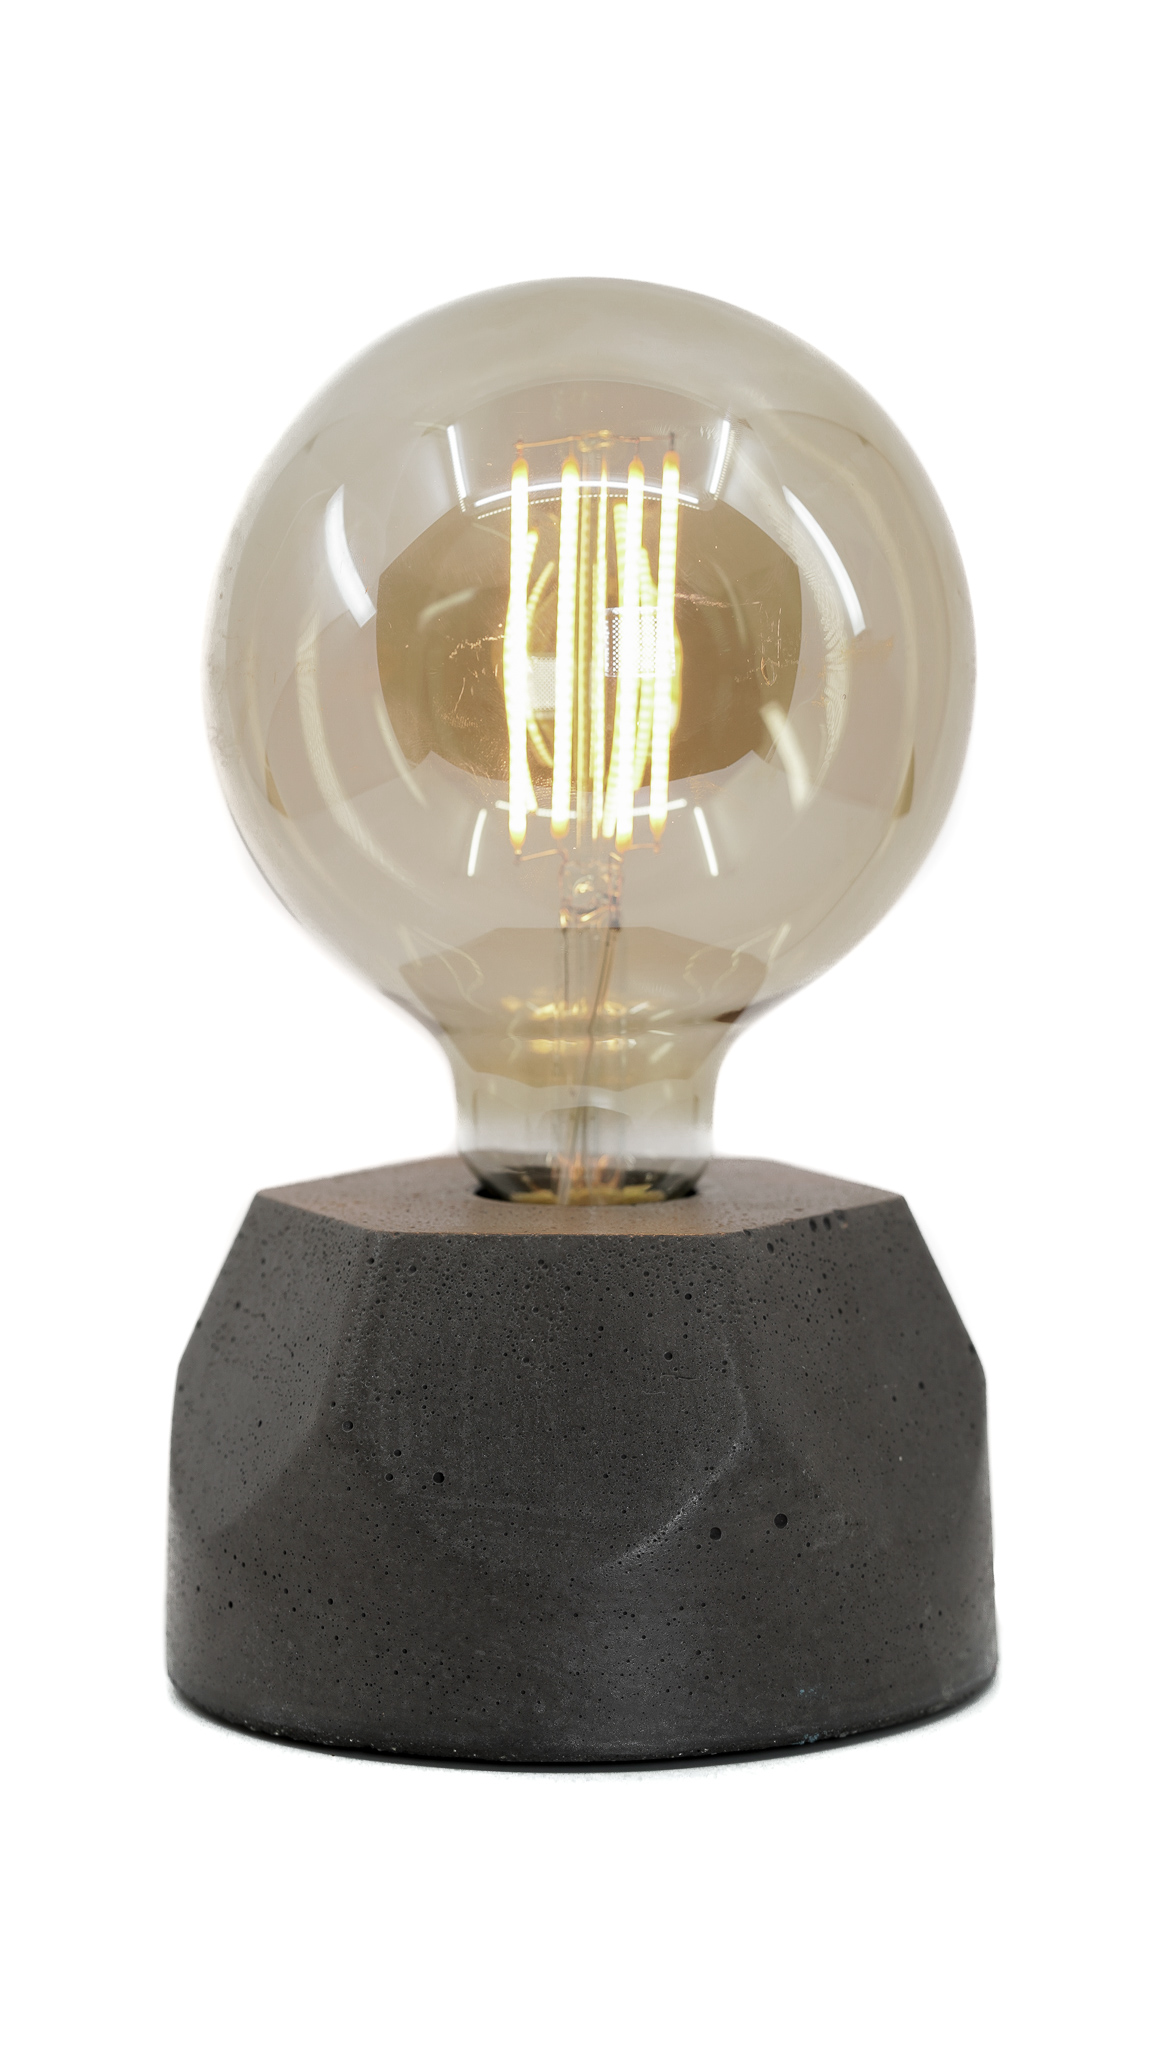 Lampe hexagone en béton anthracite fabrication artisanale